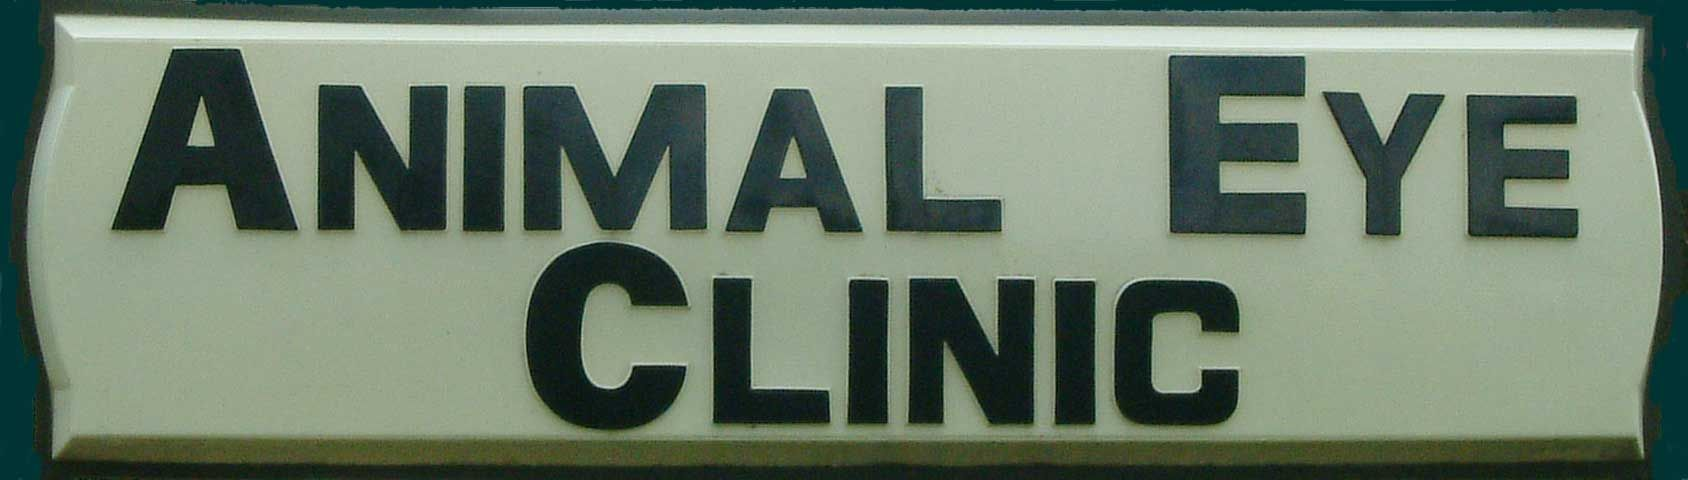 Animal Eye Clinic in Medford, NJ Clinic, Treatment, Eyes